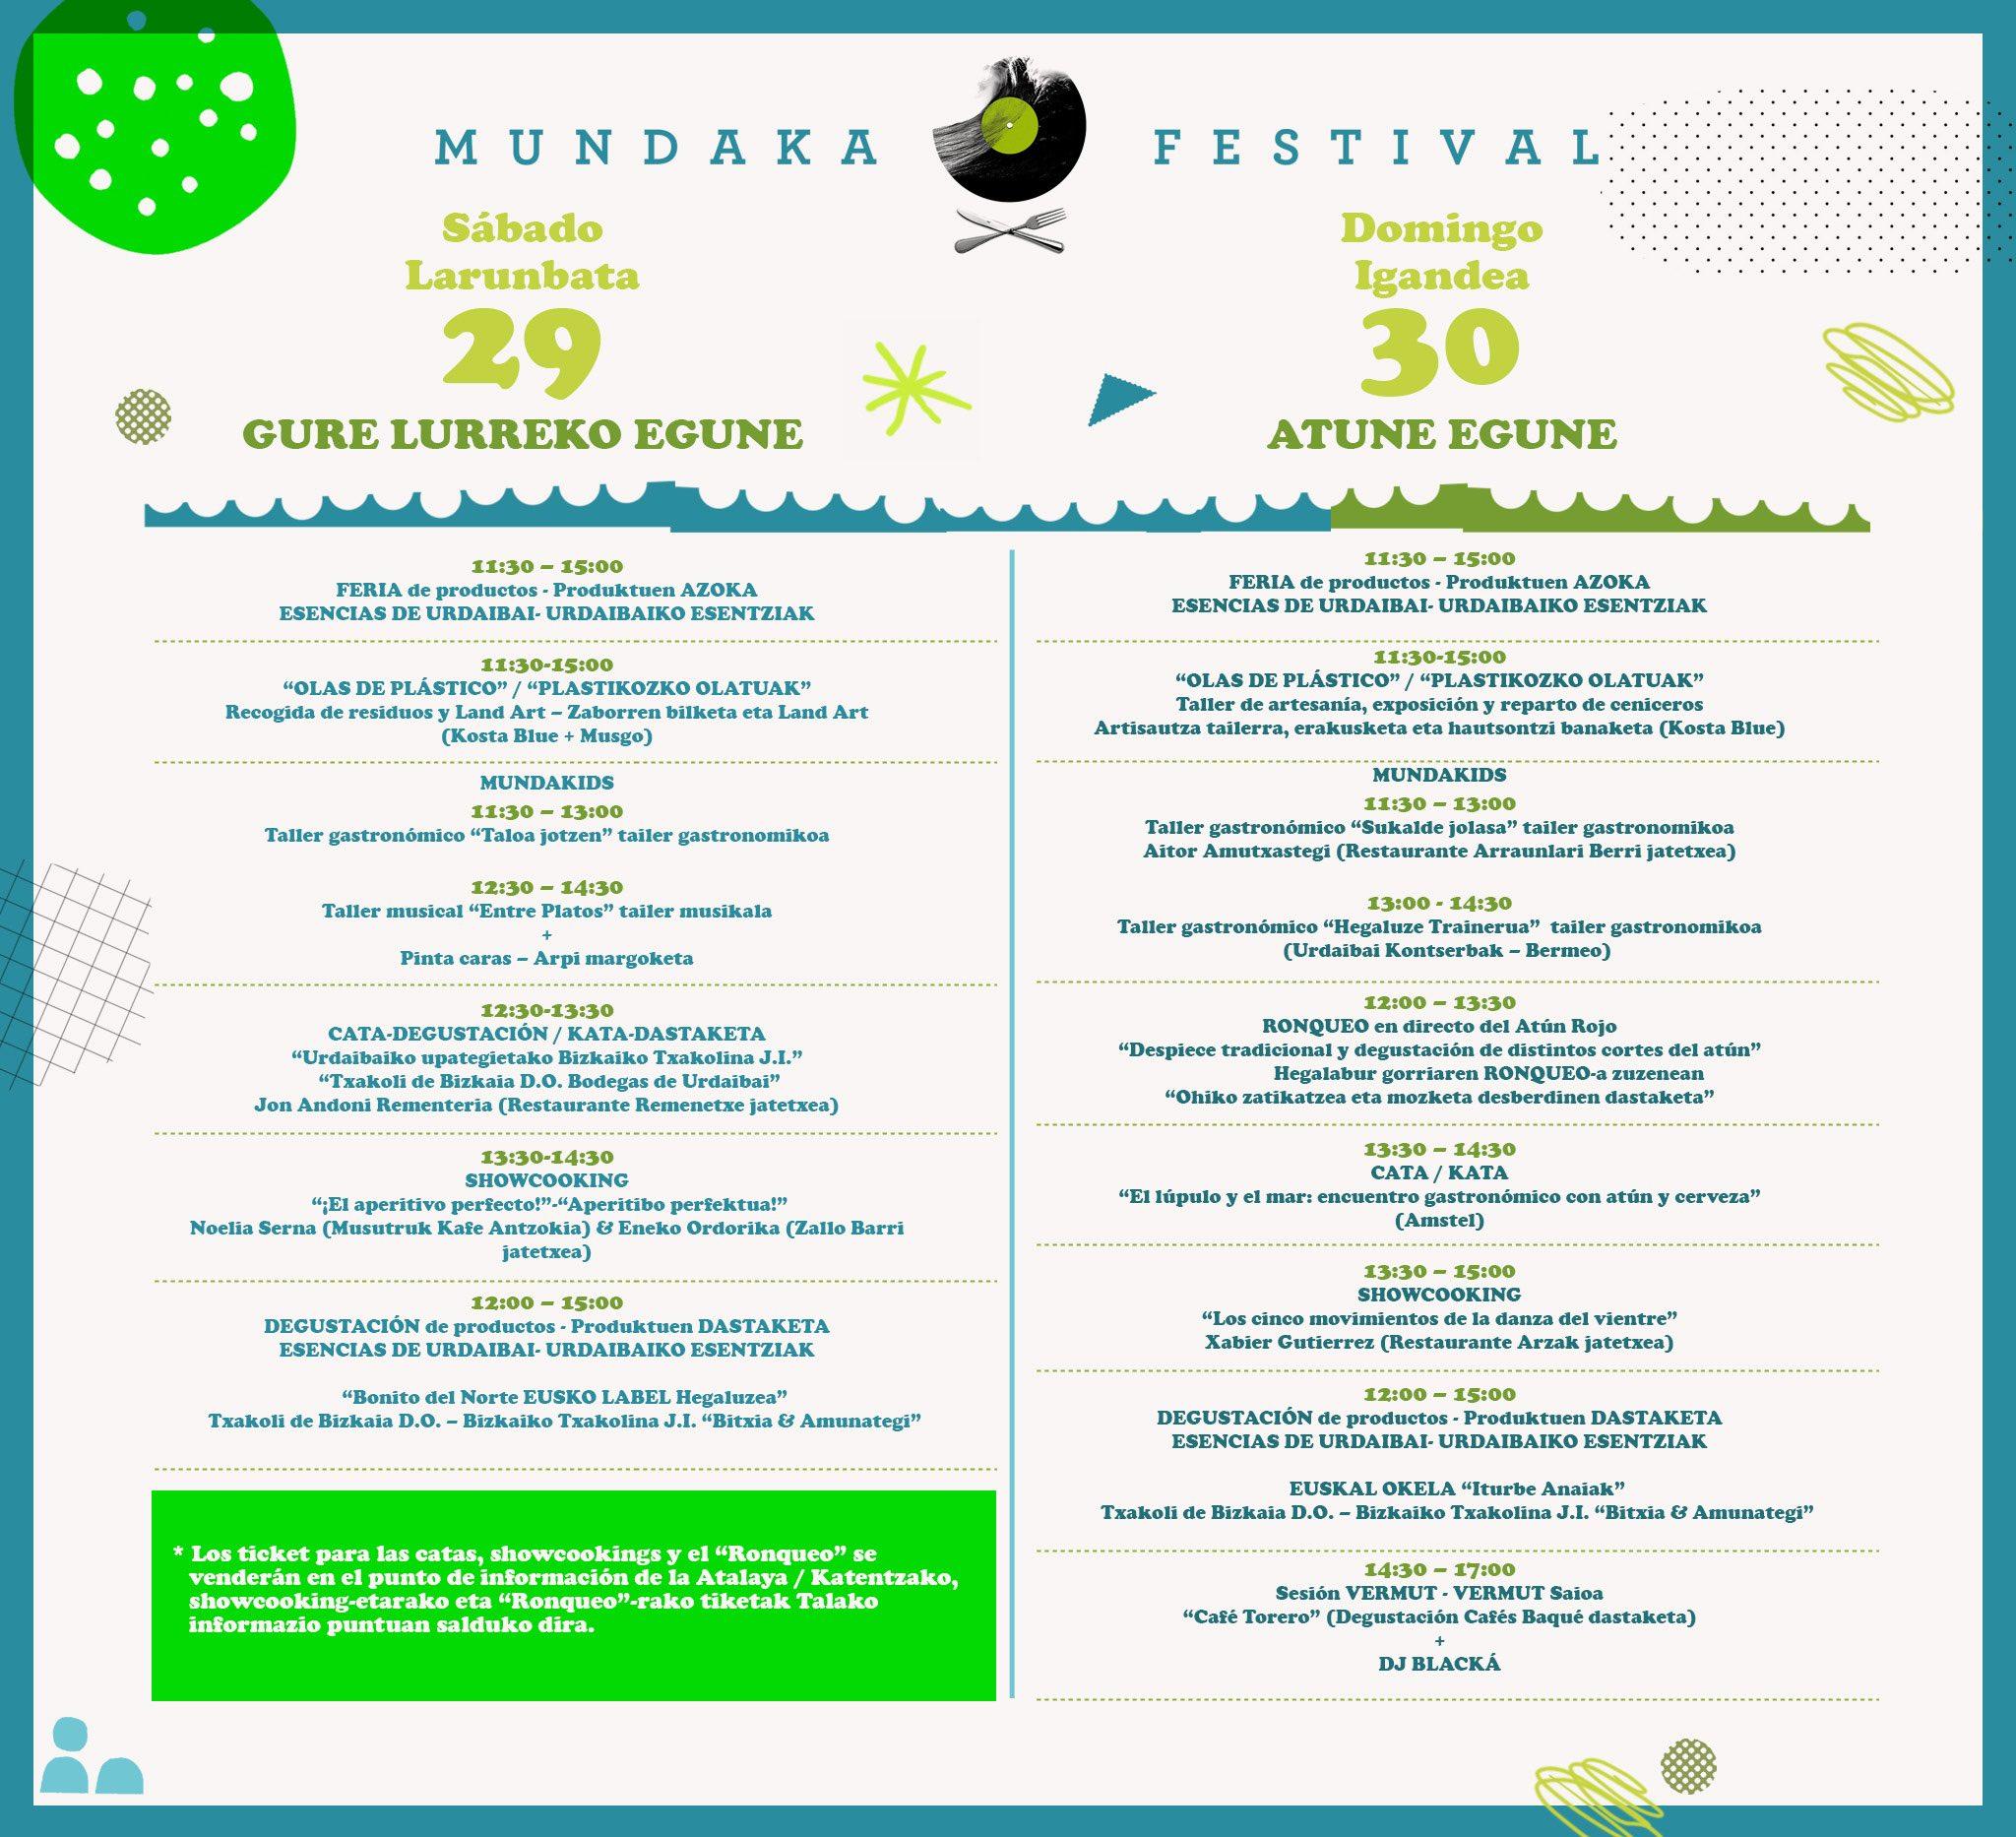 actividades Mundaka Festival 2017